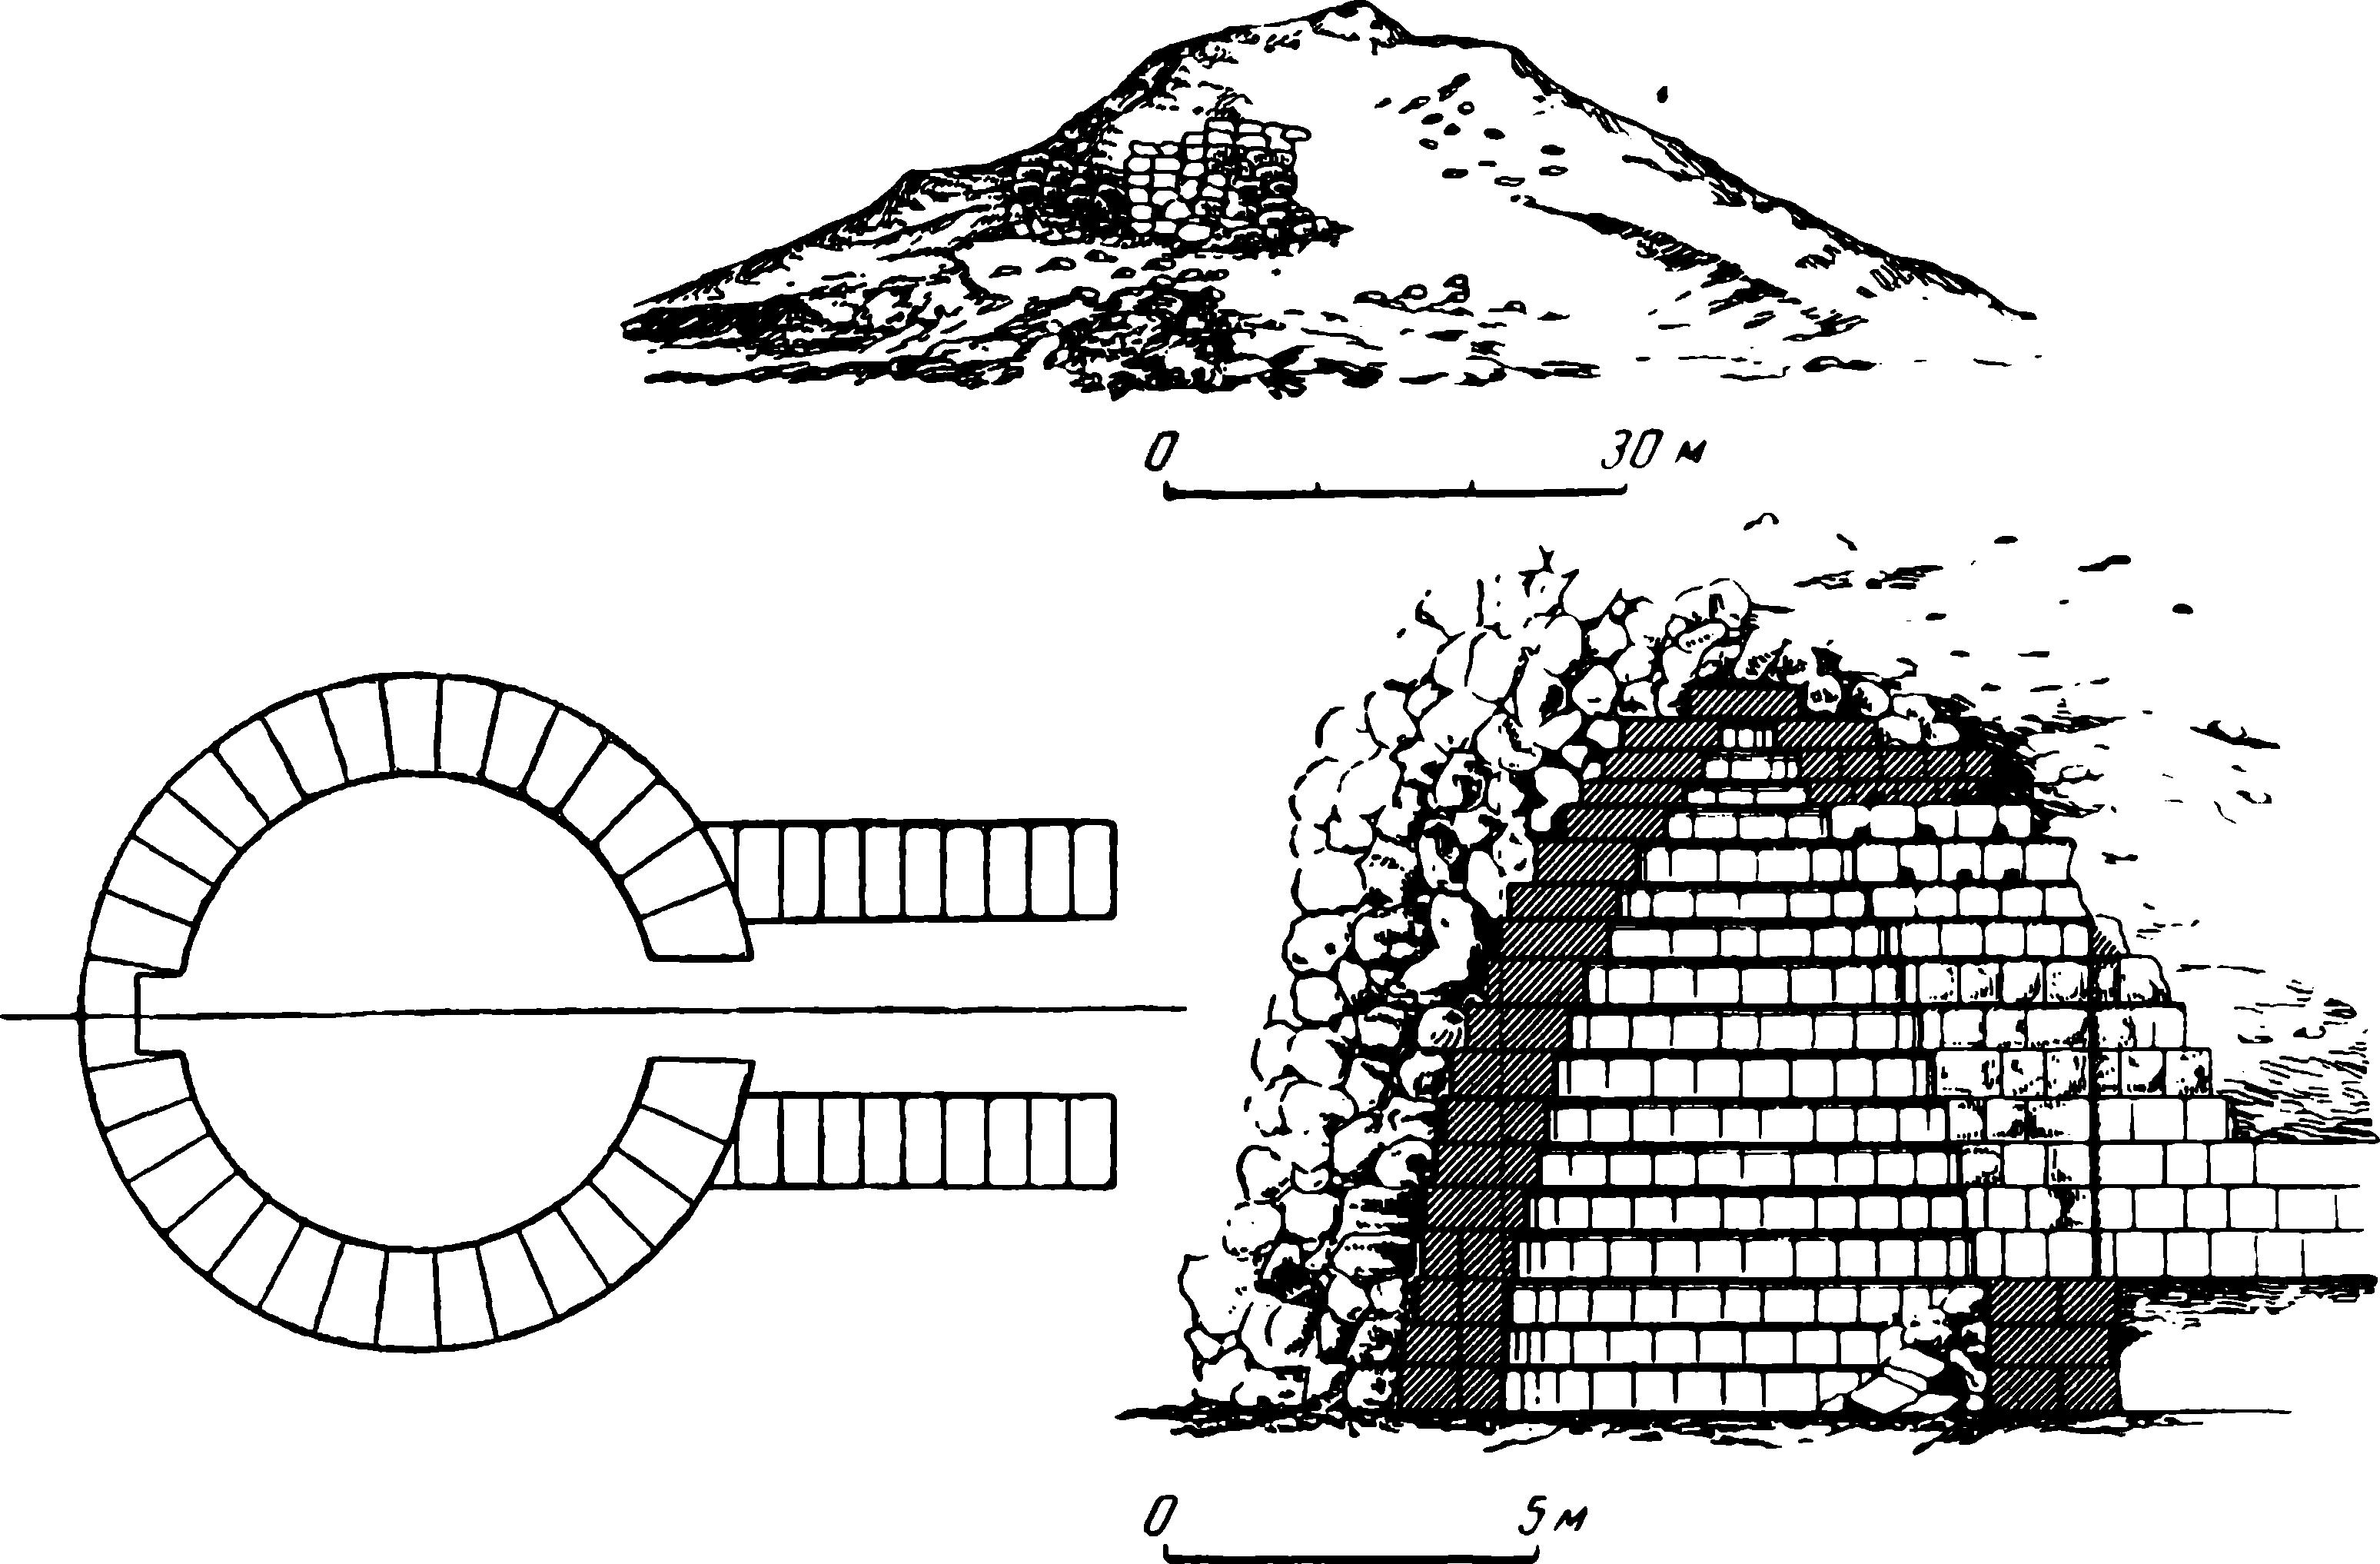 ap-71